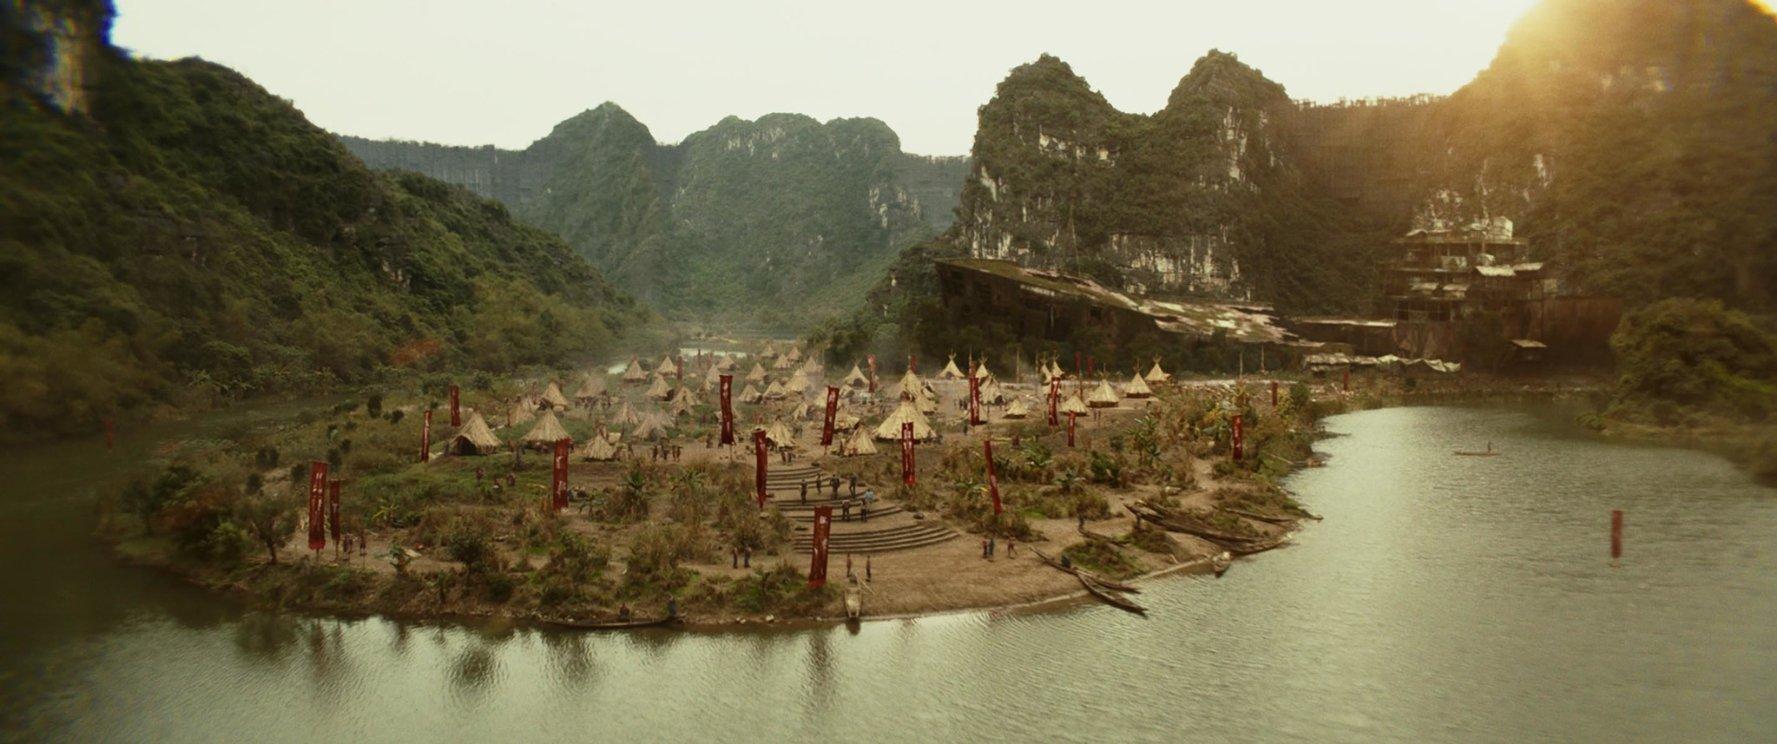 How Long Is King Kong Skull Island